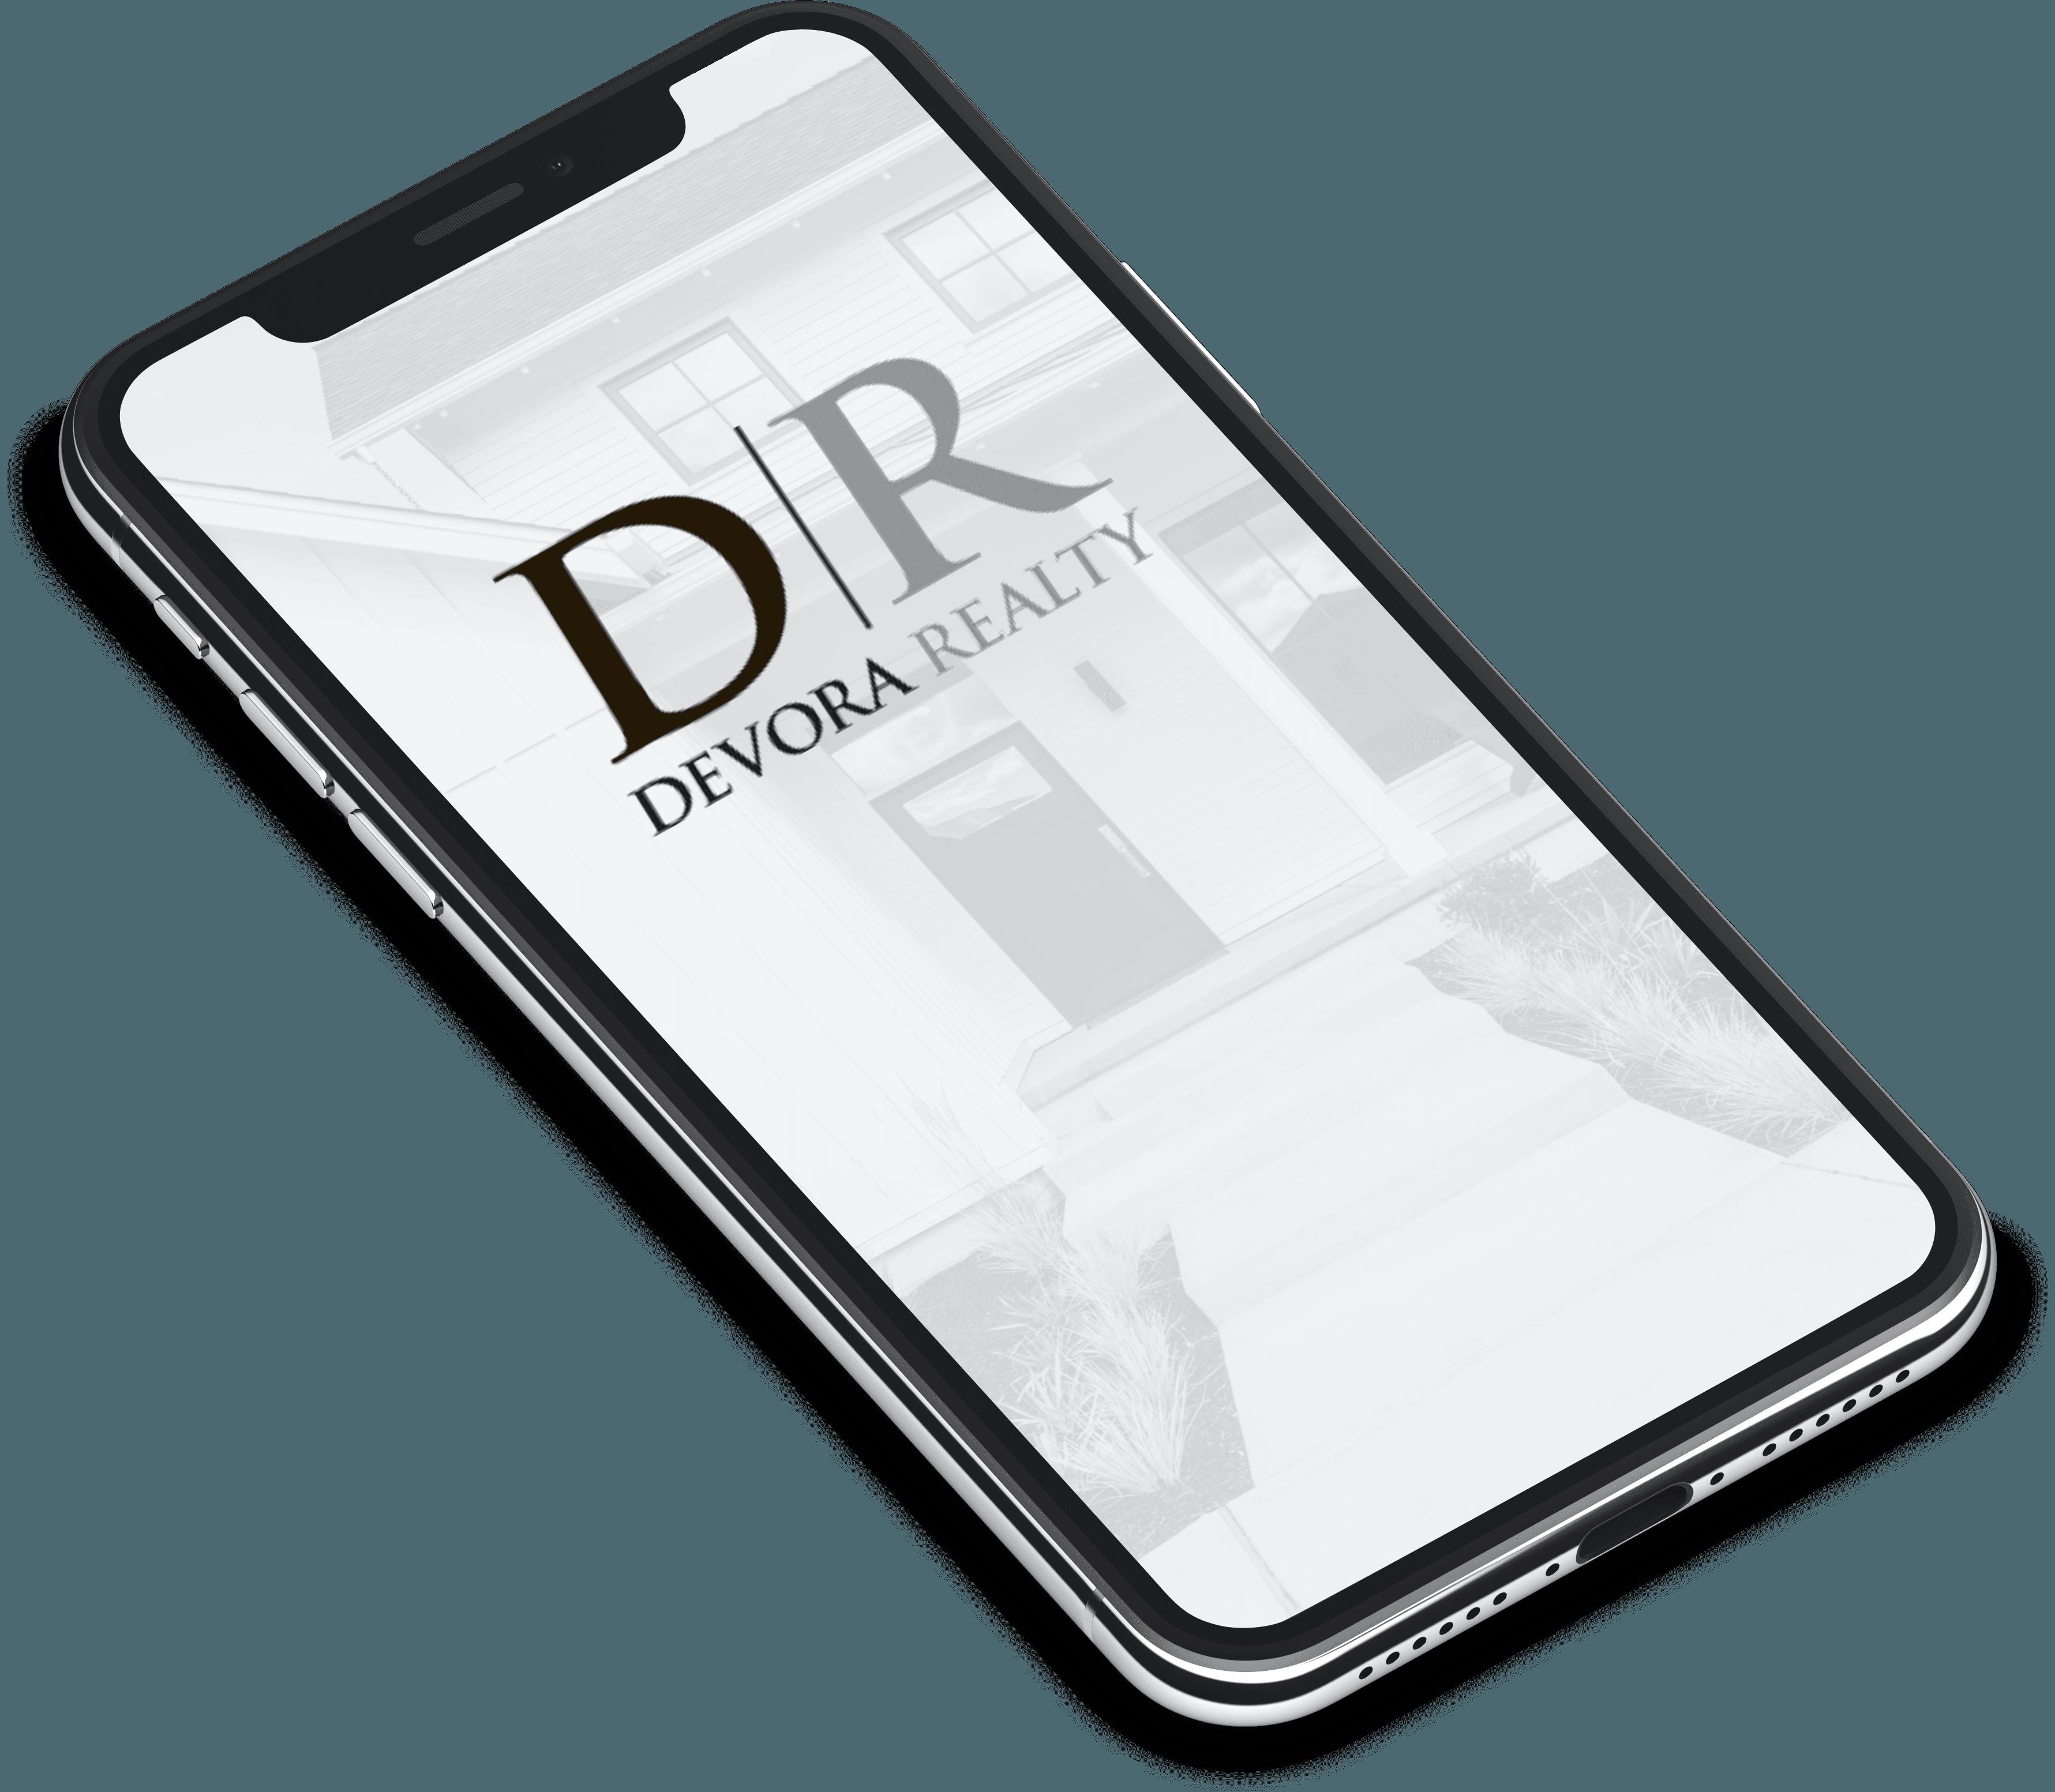 Devora App